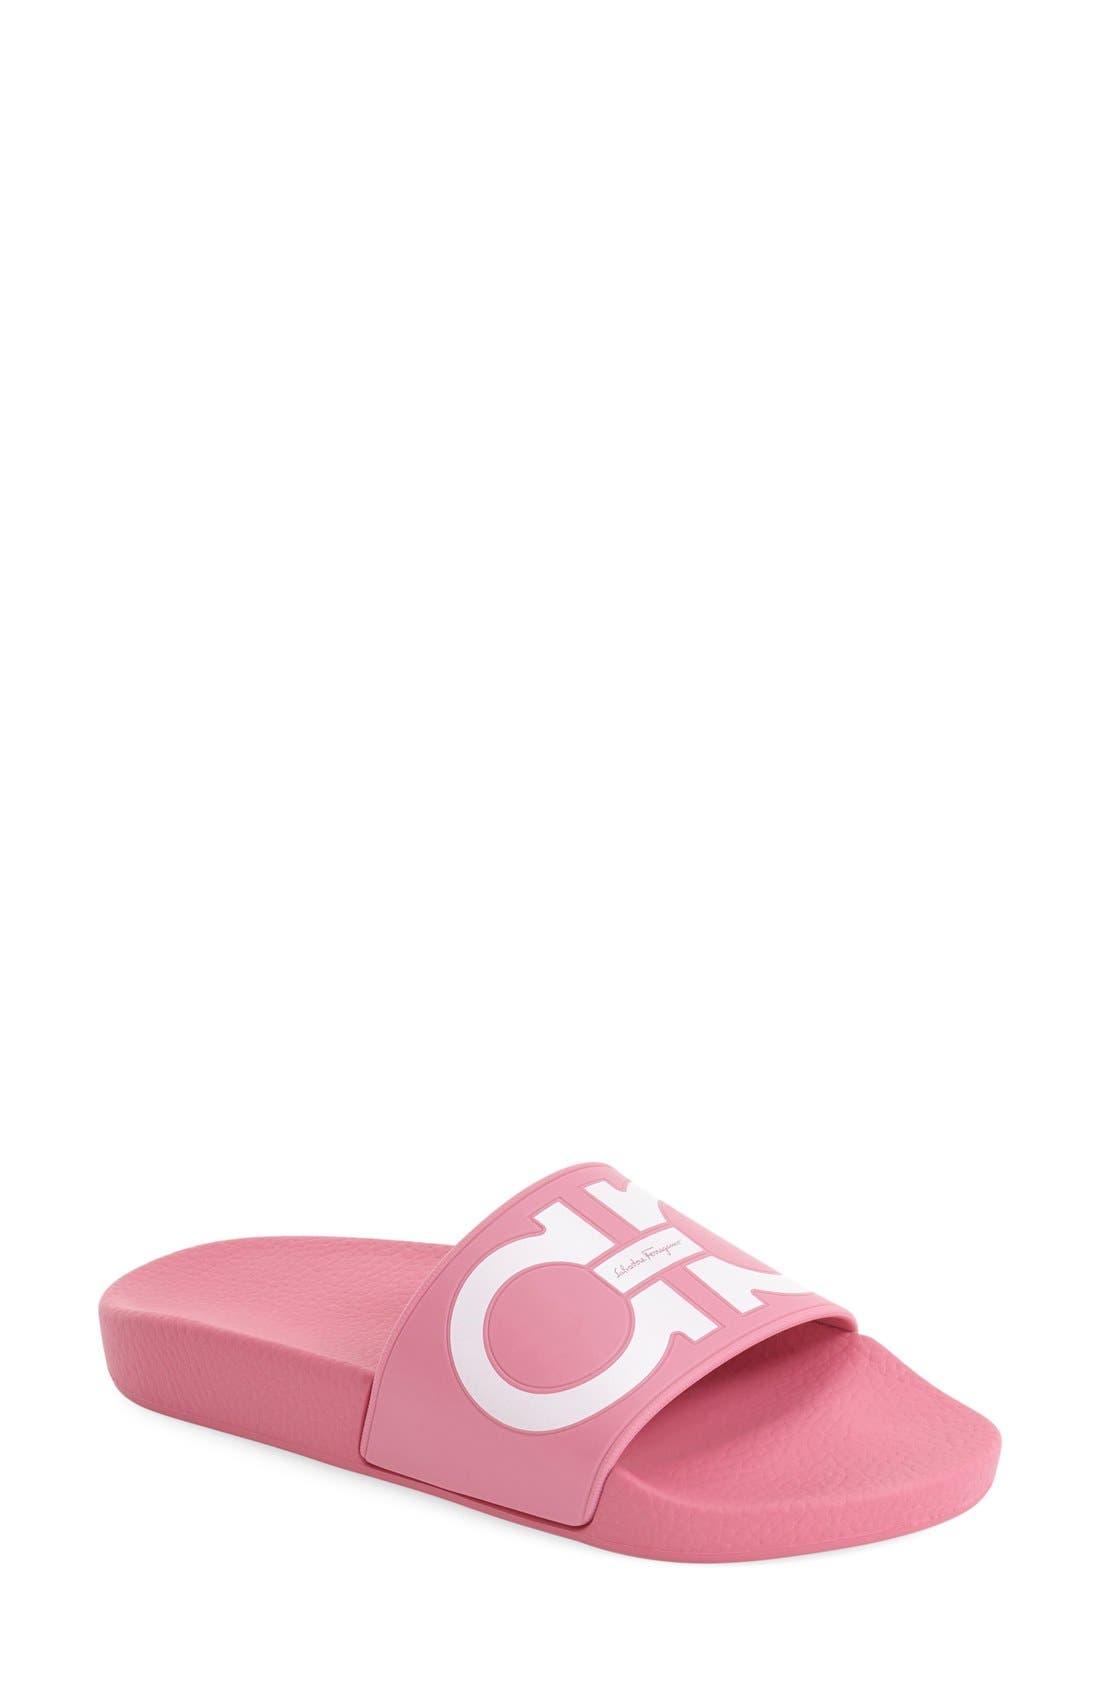 Groove Logo Slide Sandal,                             Main thumbnail 1, color,                             Bubble Gum Pink/ White